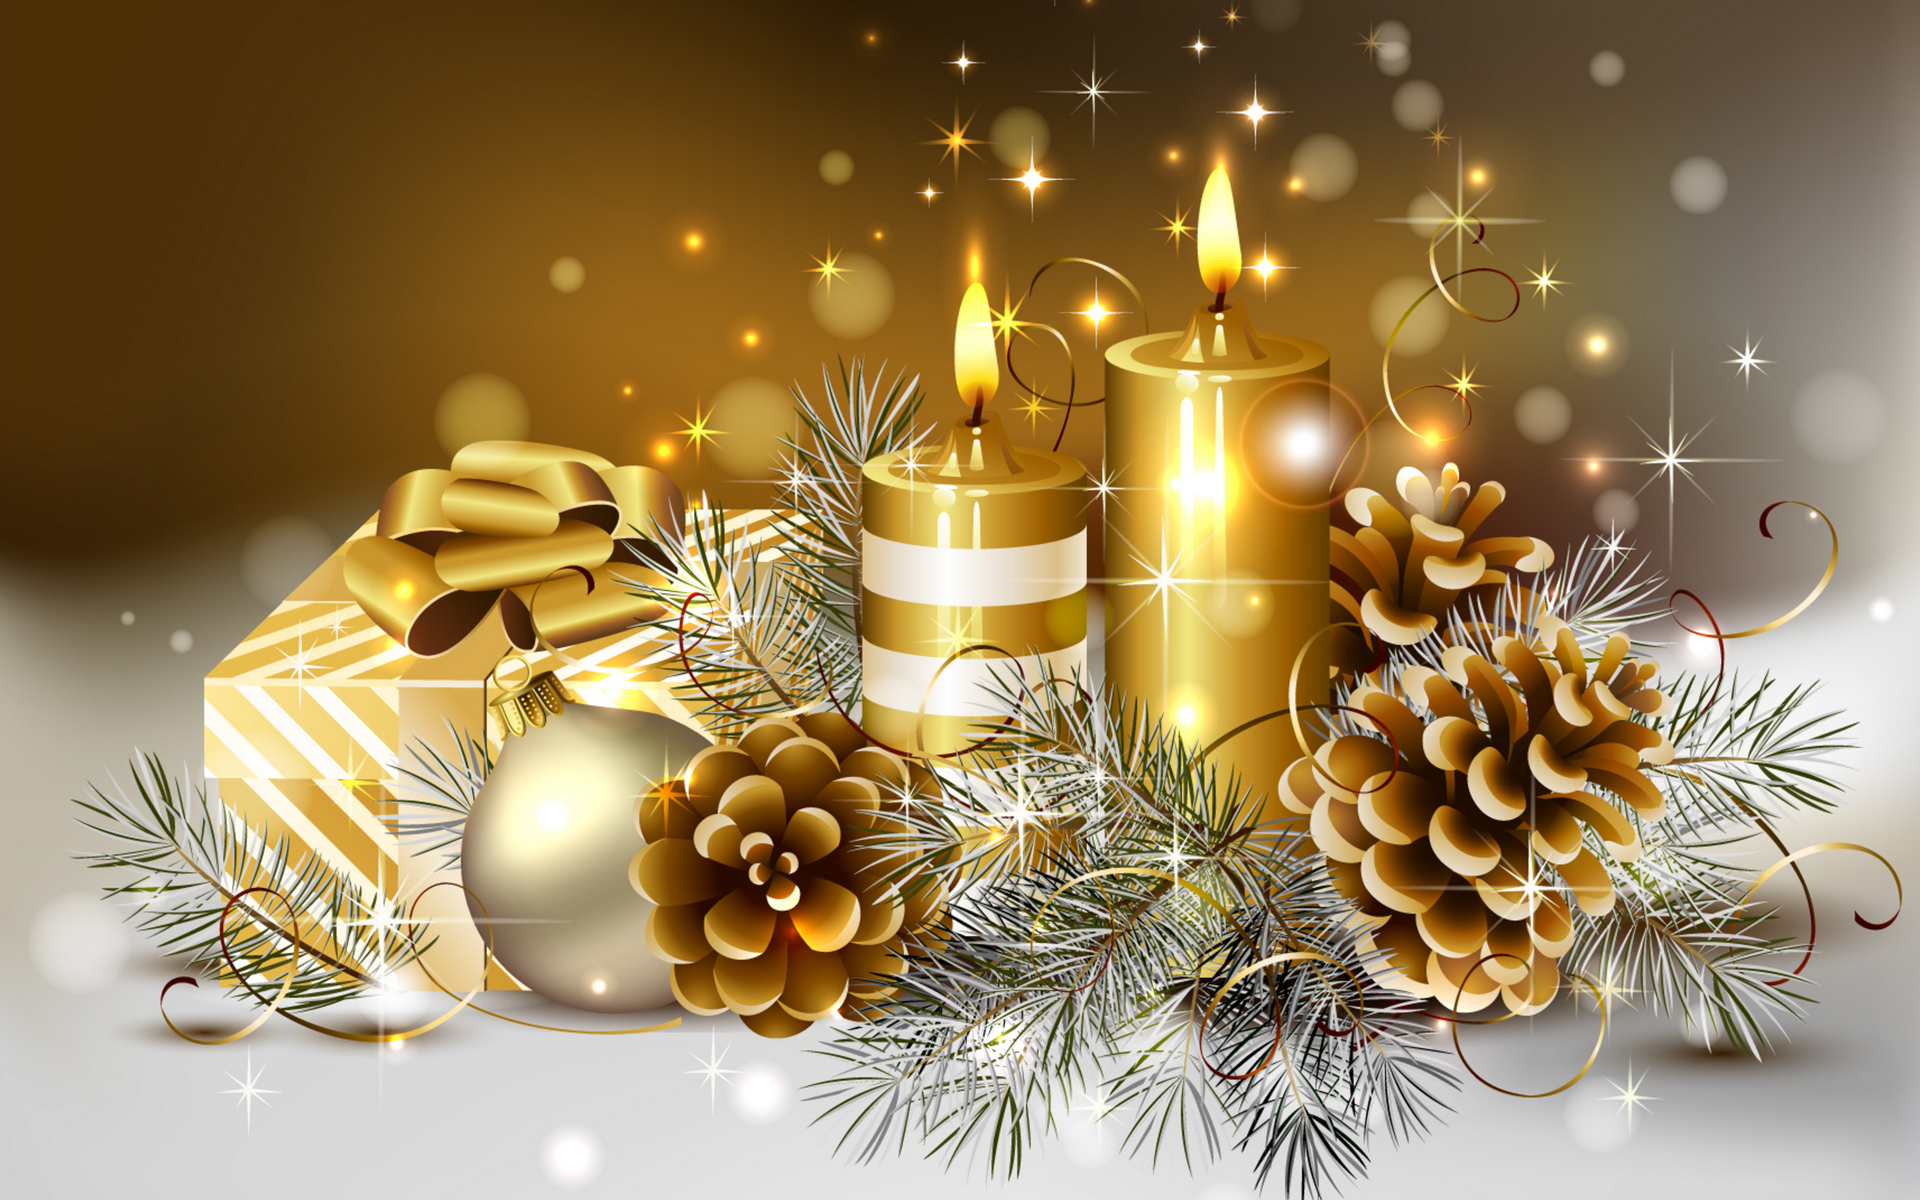 Merry-Christmas-Full-HD-Wallpapers.jpg